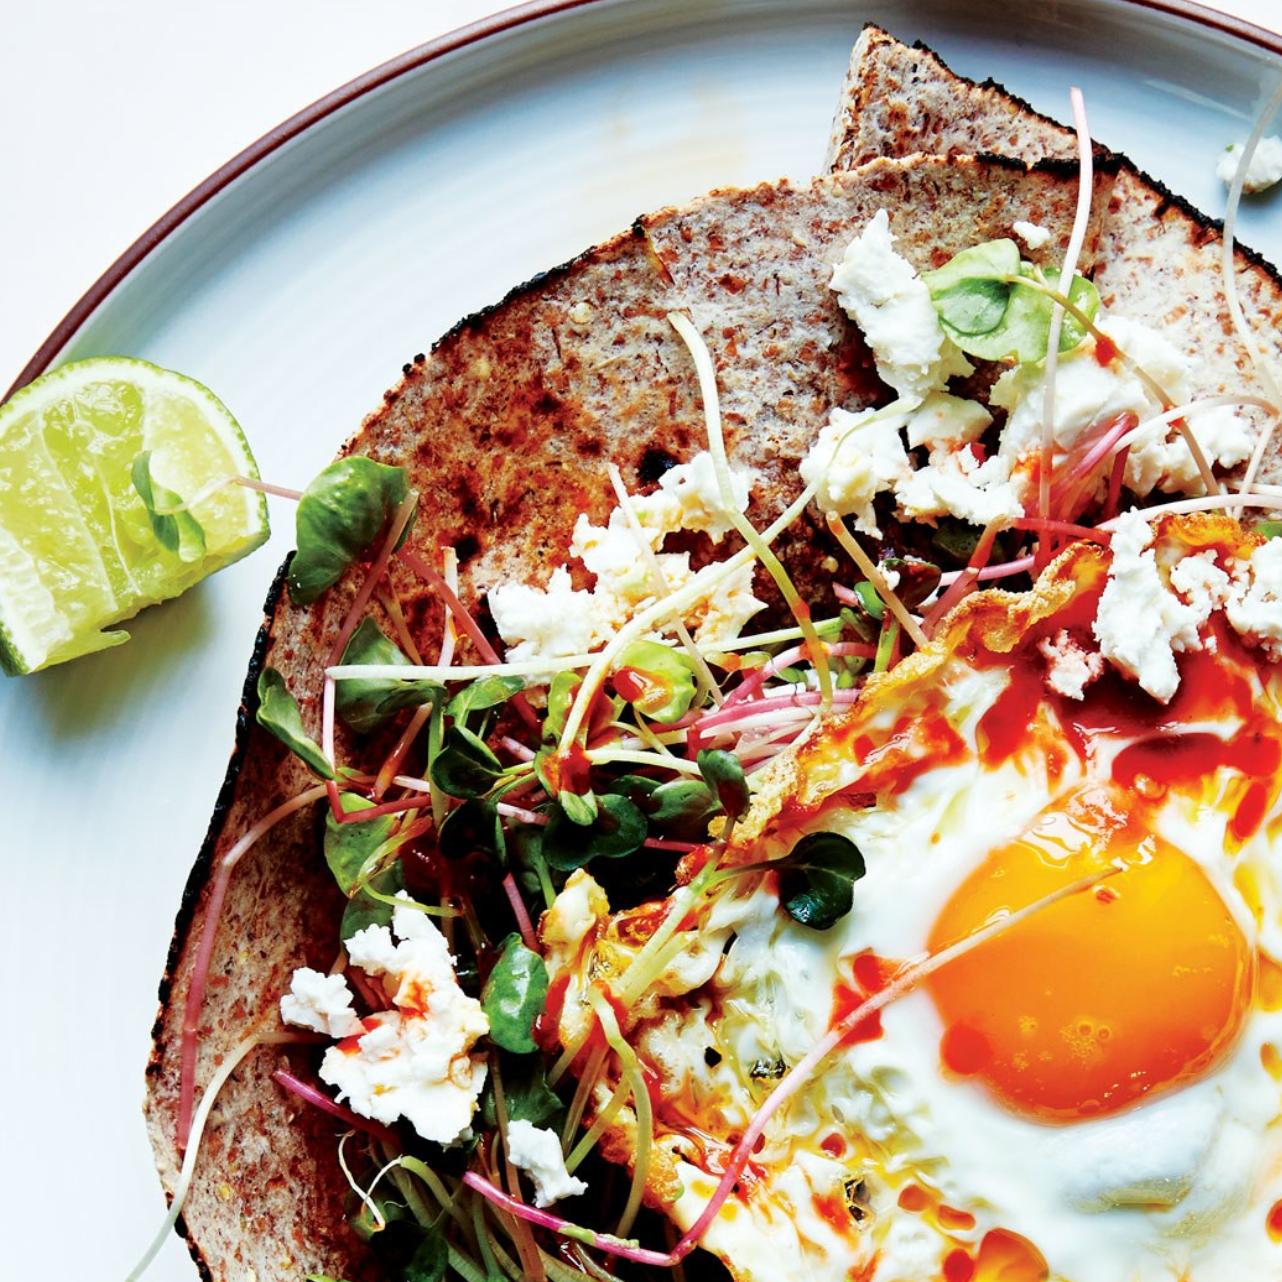 Fried Egg with Avocado & Microgreens -